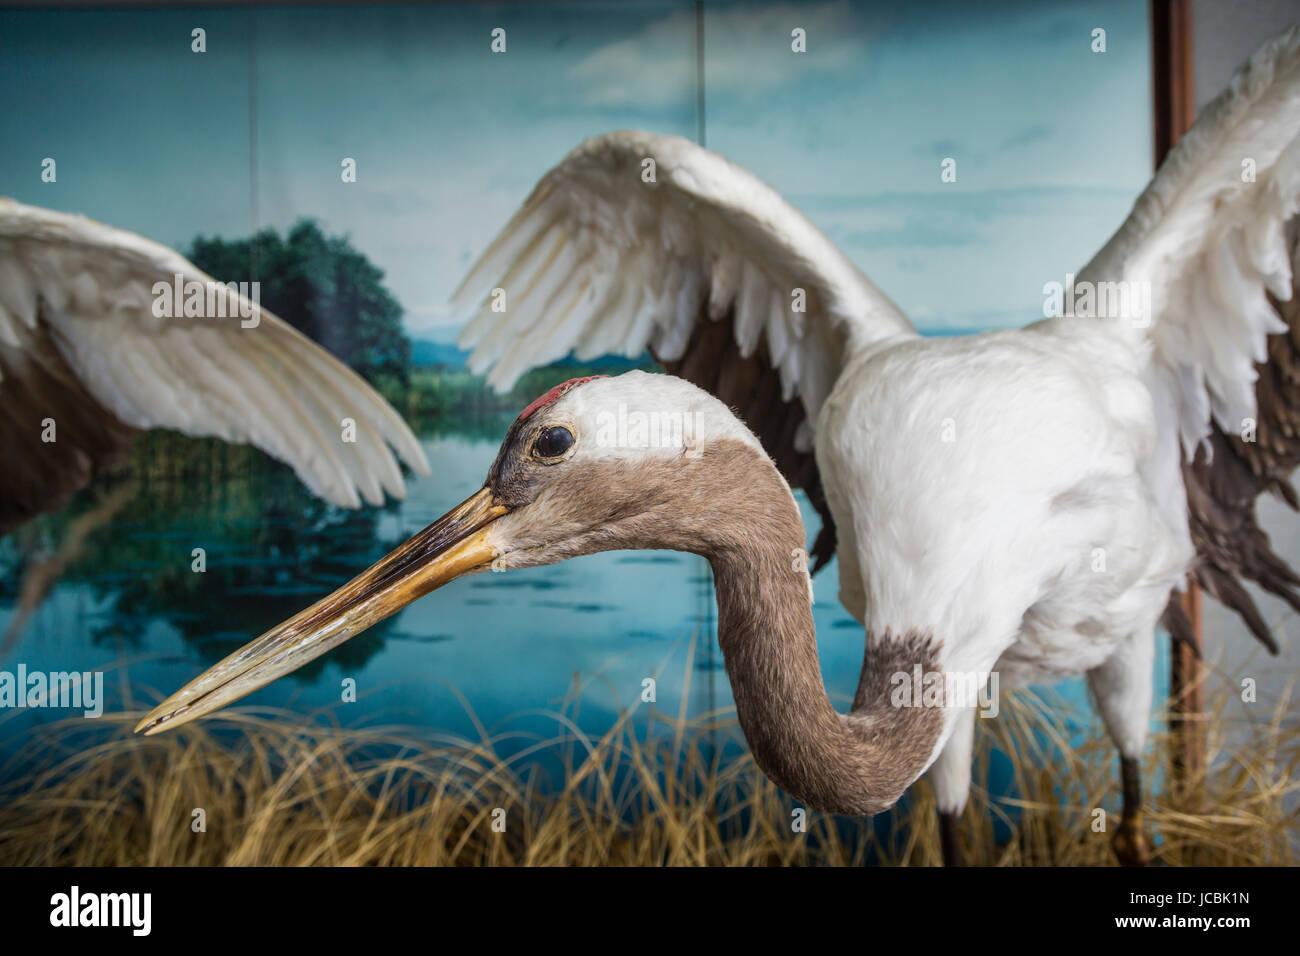 Ein großer Kran Vogel in Kushiro City, Präfektur, Hokkaido, Japan ausgestellt... Stockbild